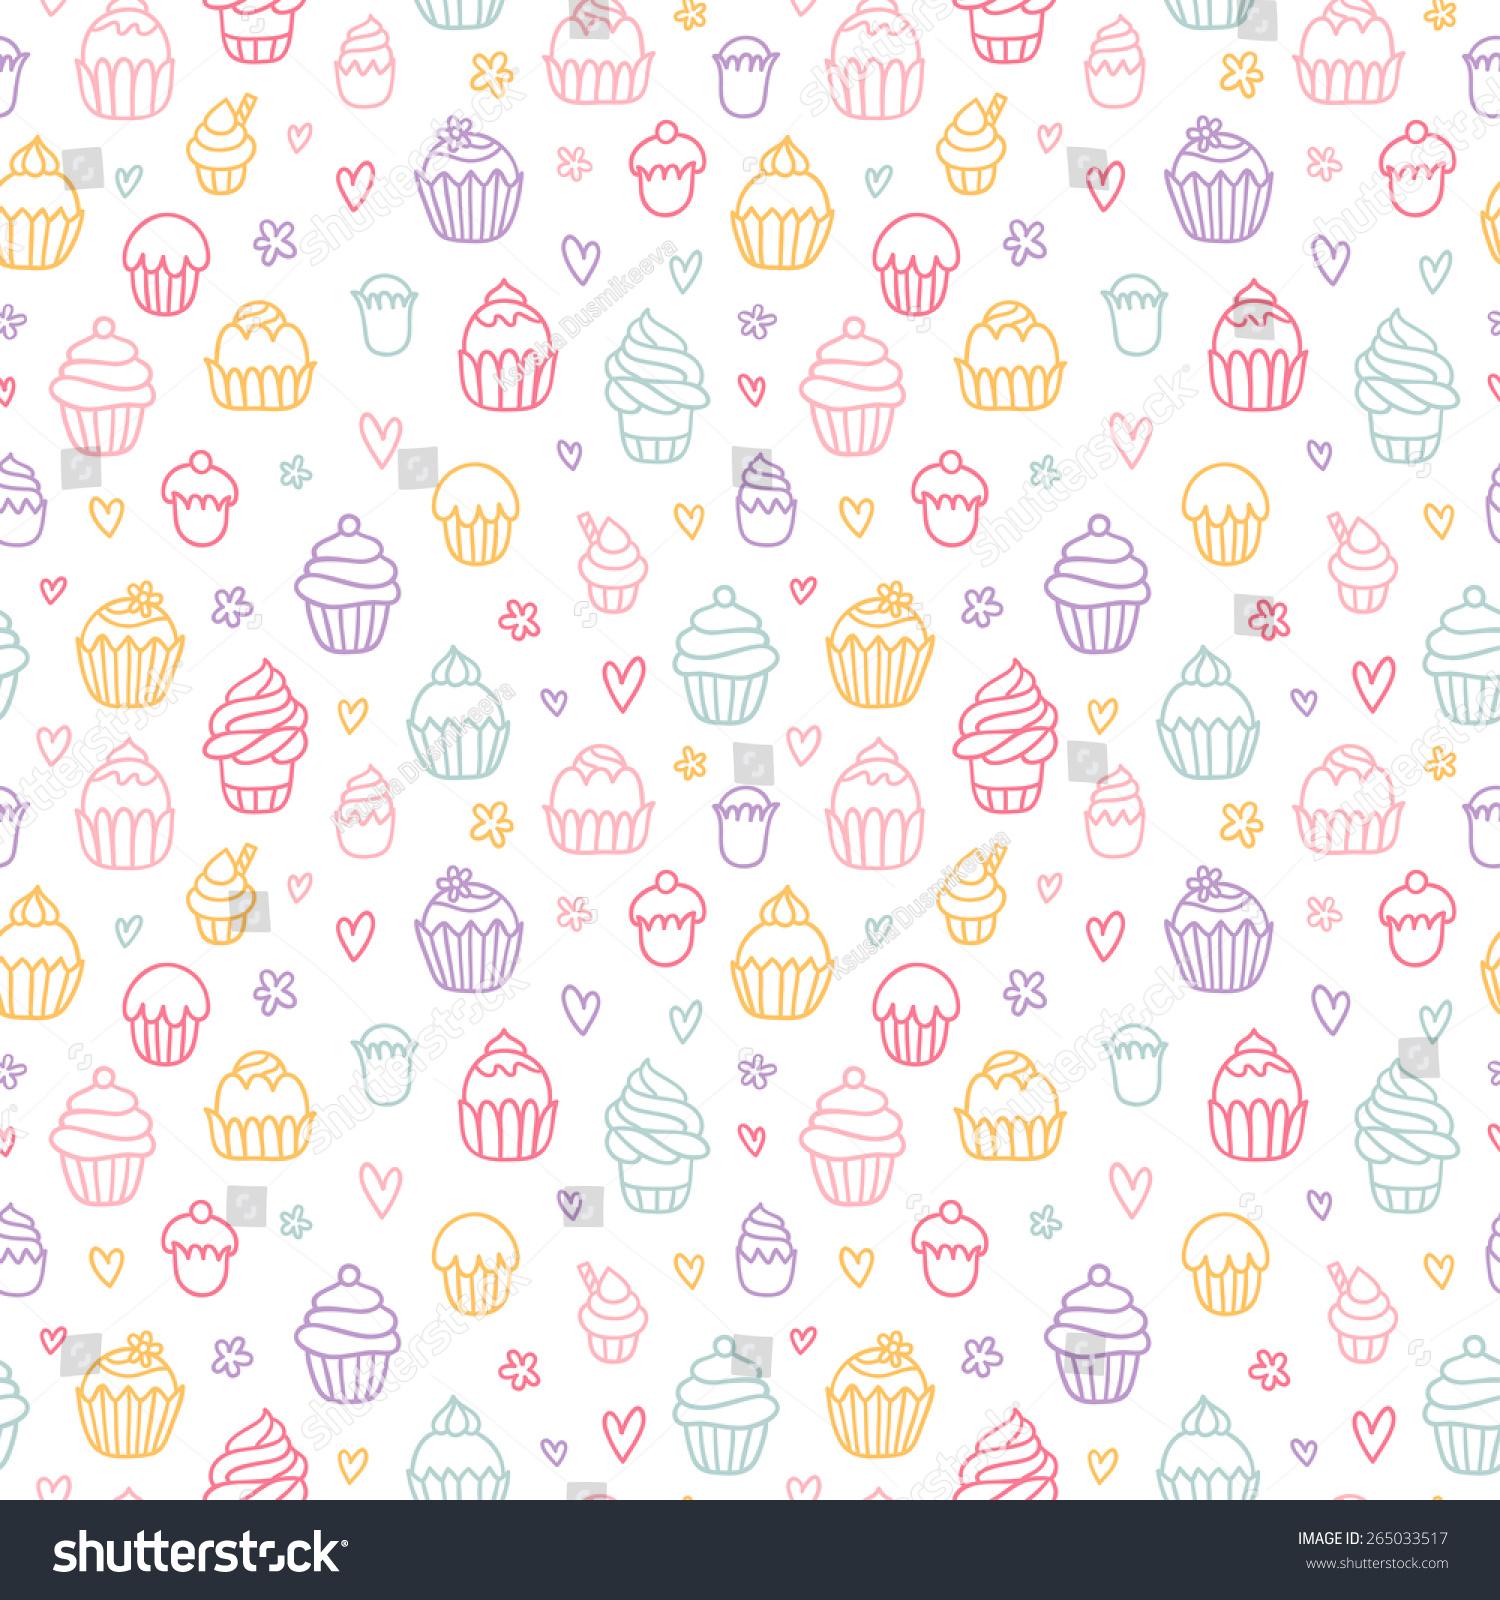 white gir cupcake wallpaper - photo #14